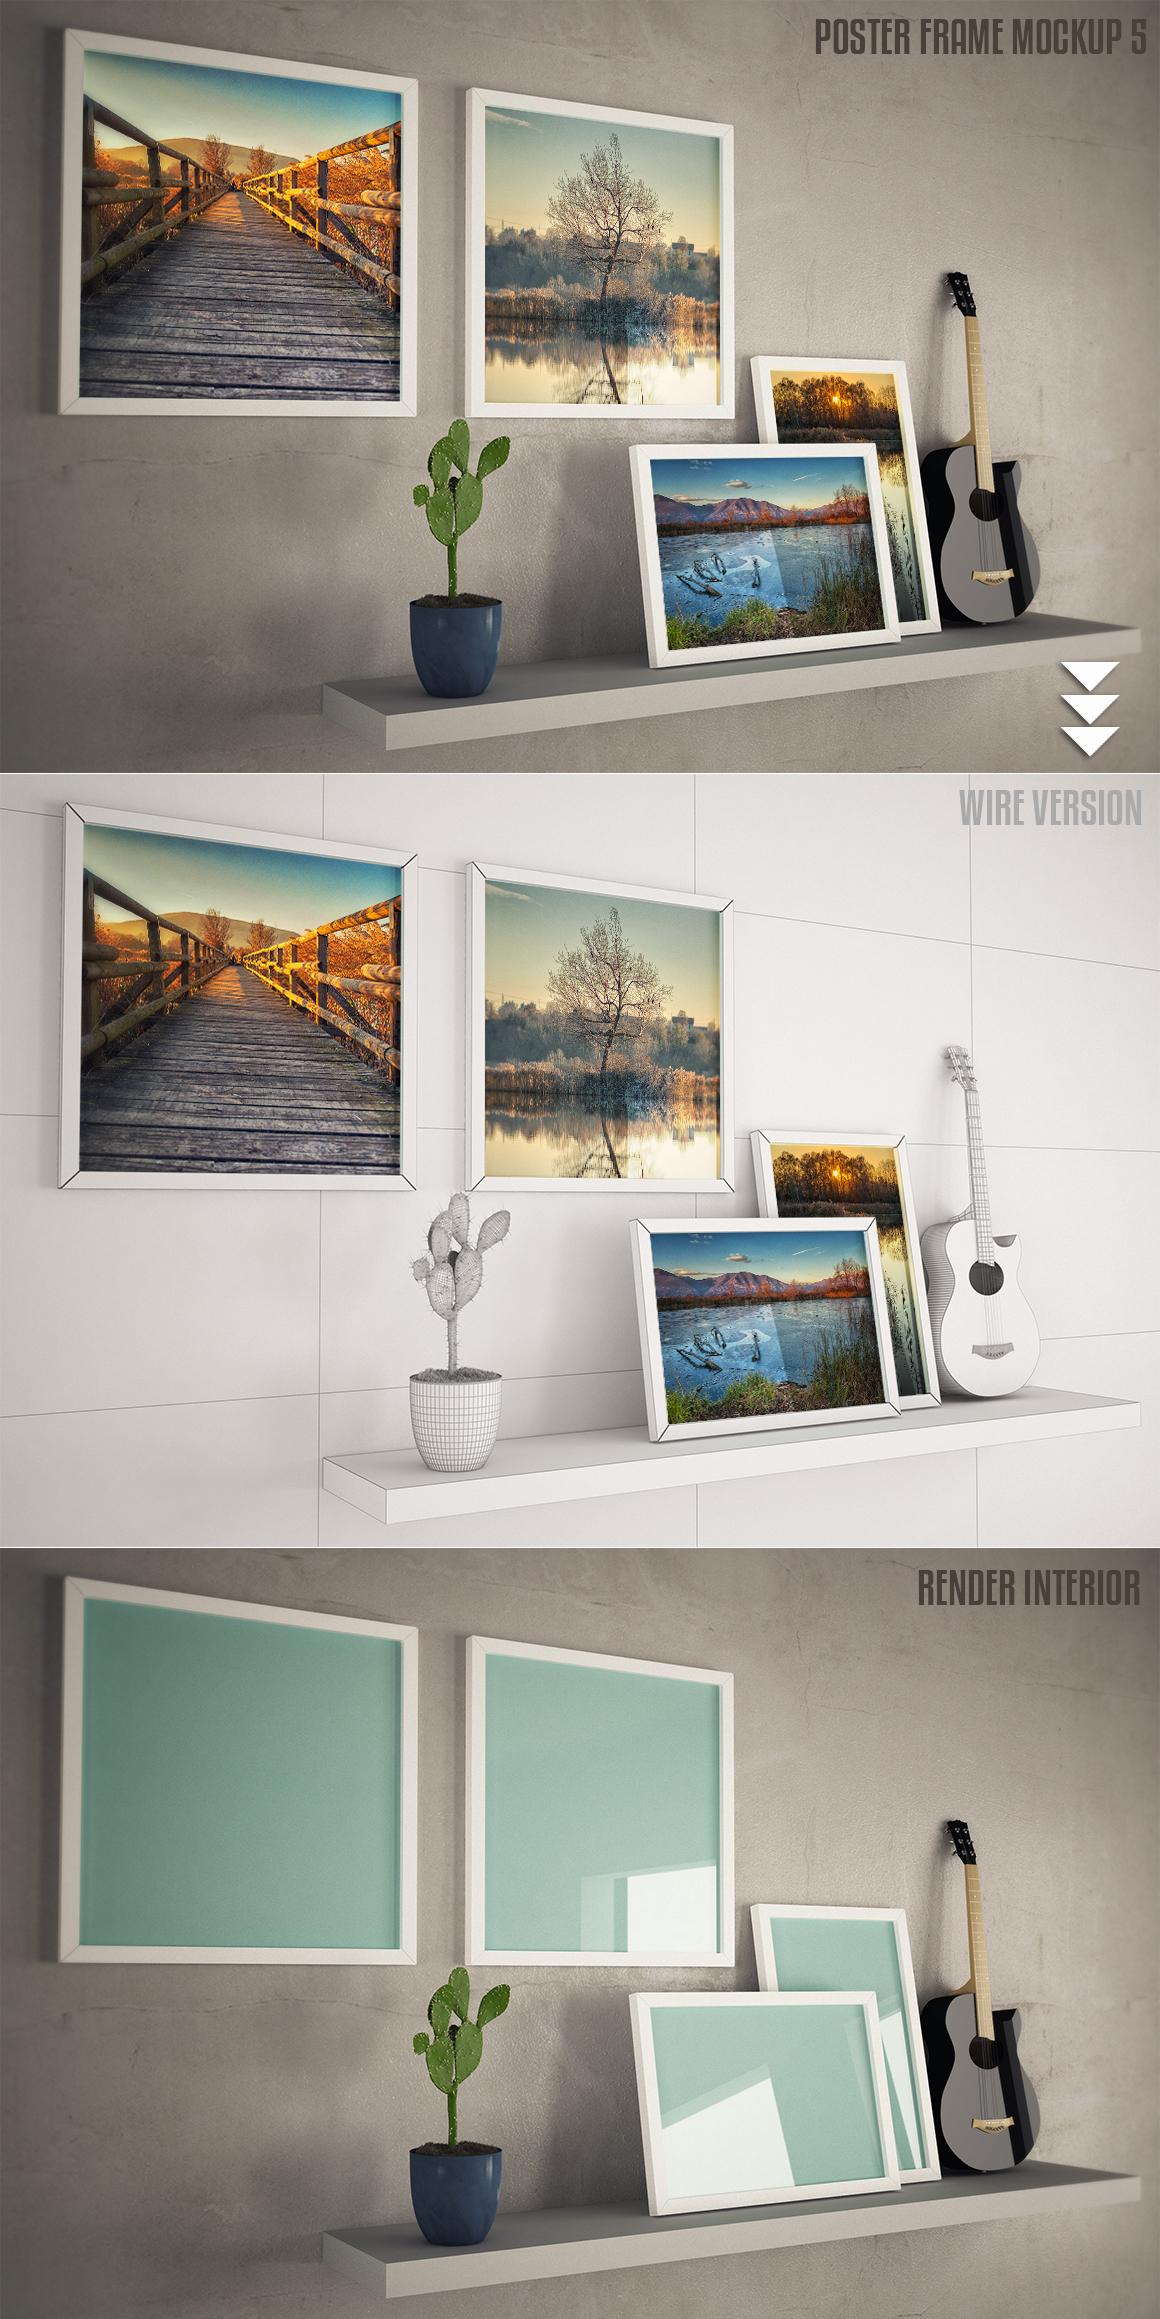 Interiors mock-up Vol. 2 example image 4